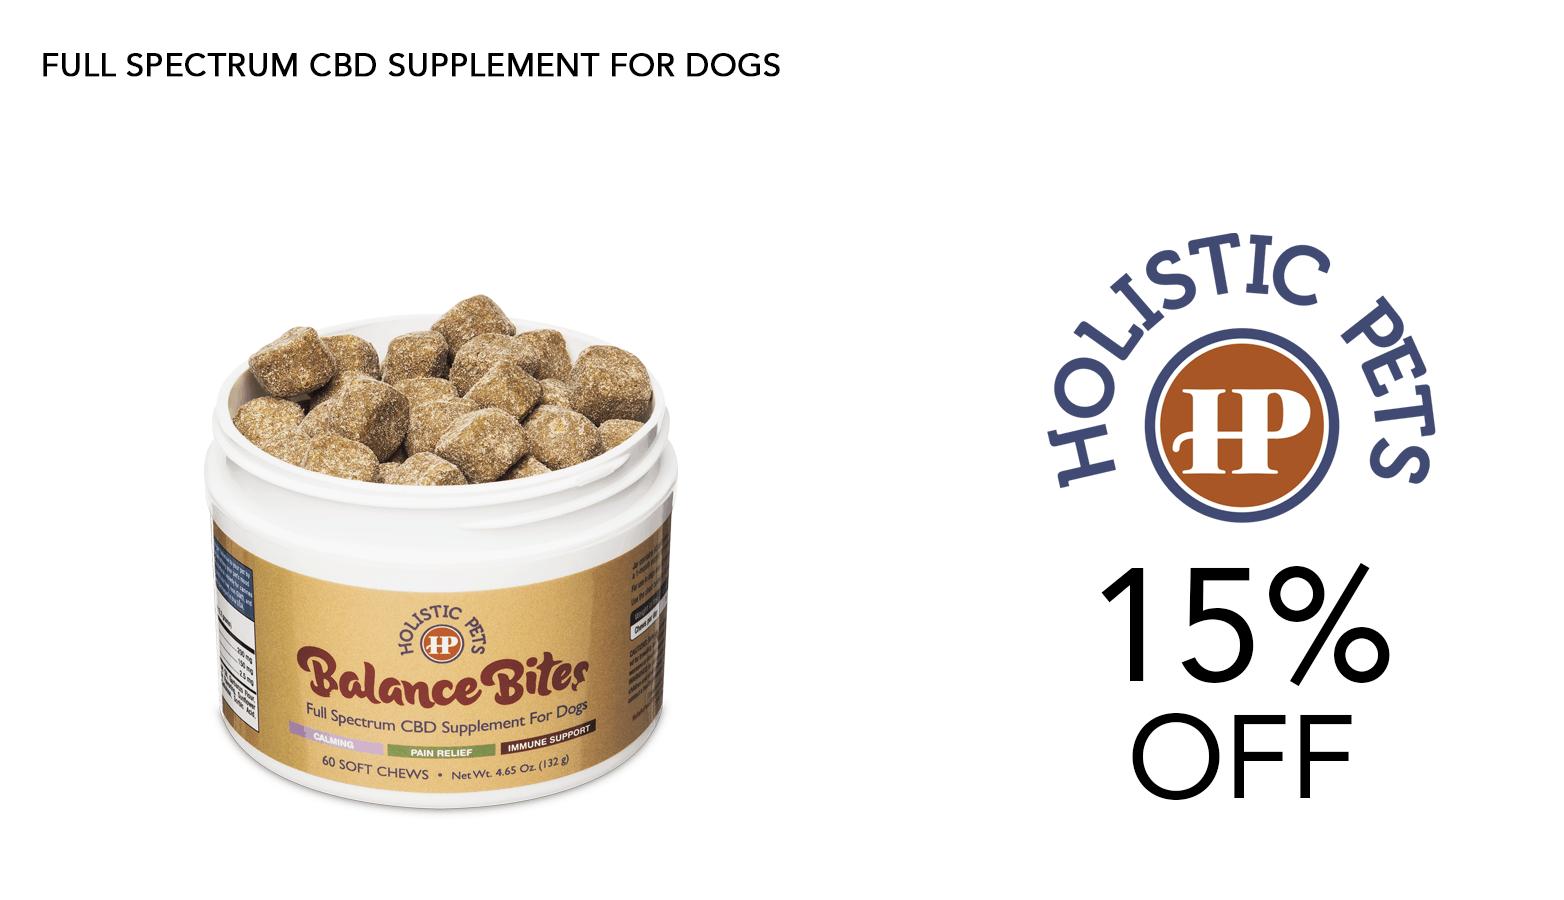 Holistic Pets CBD Coupon Code Website